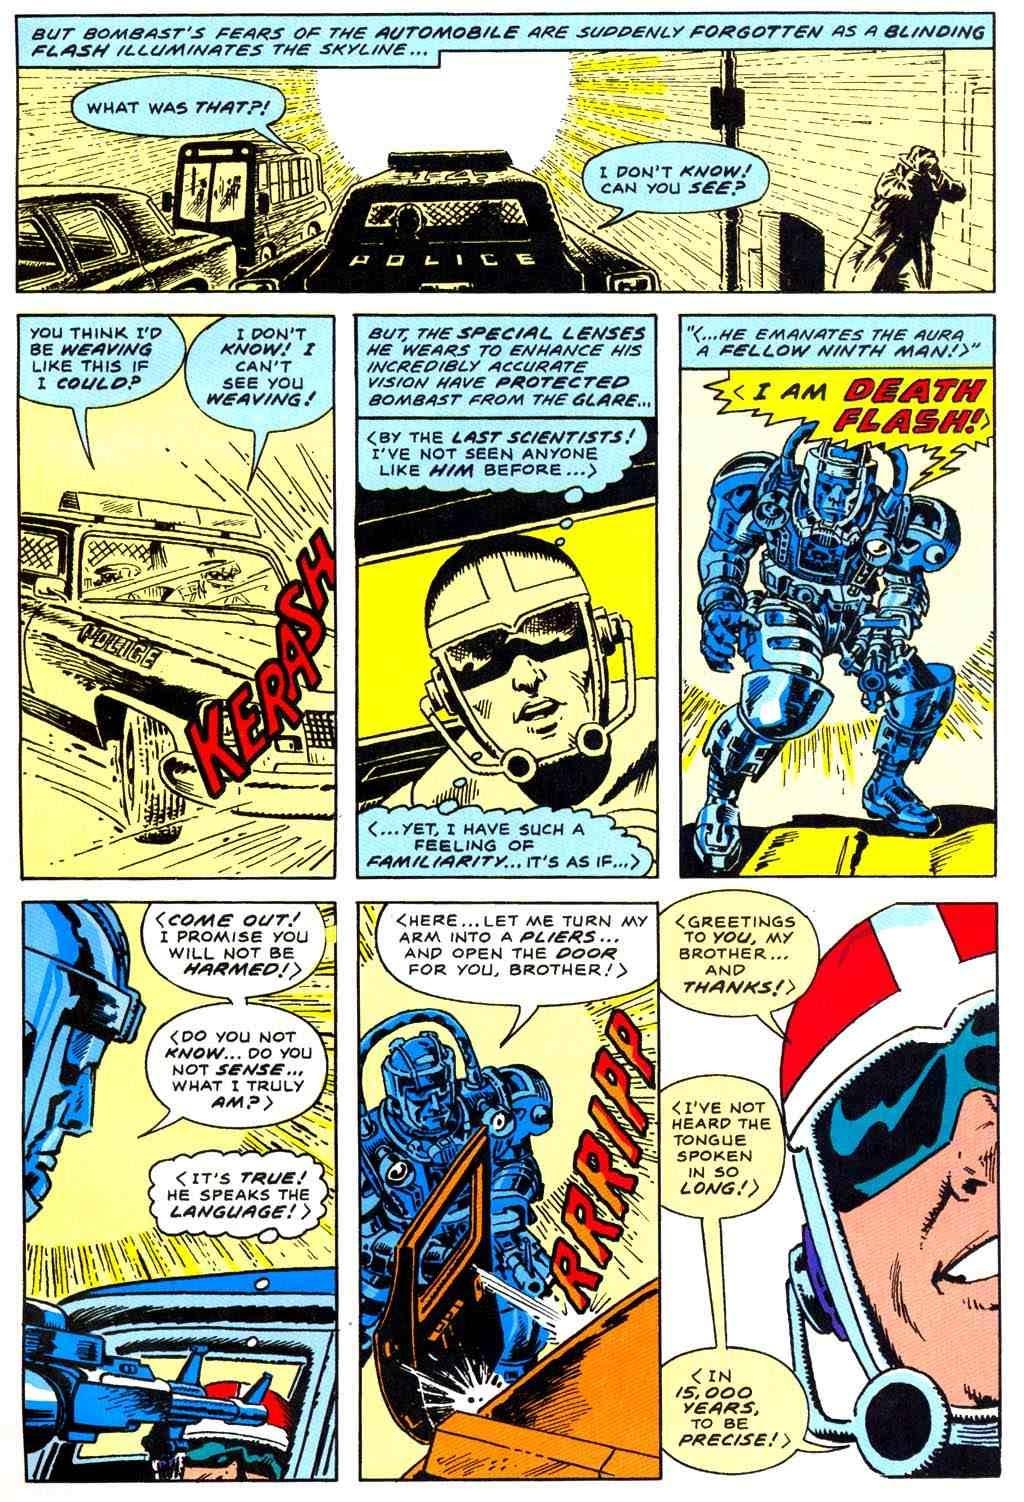 Read online Bombast comic -  Issue # Full - 21